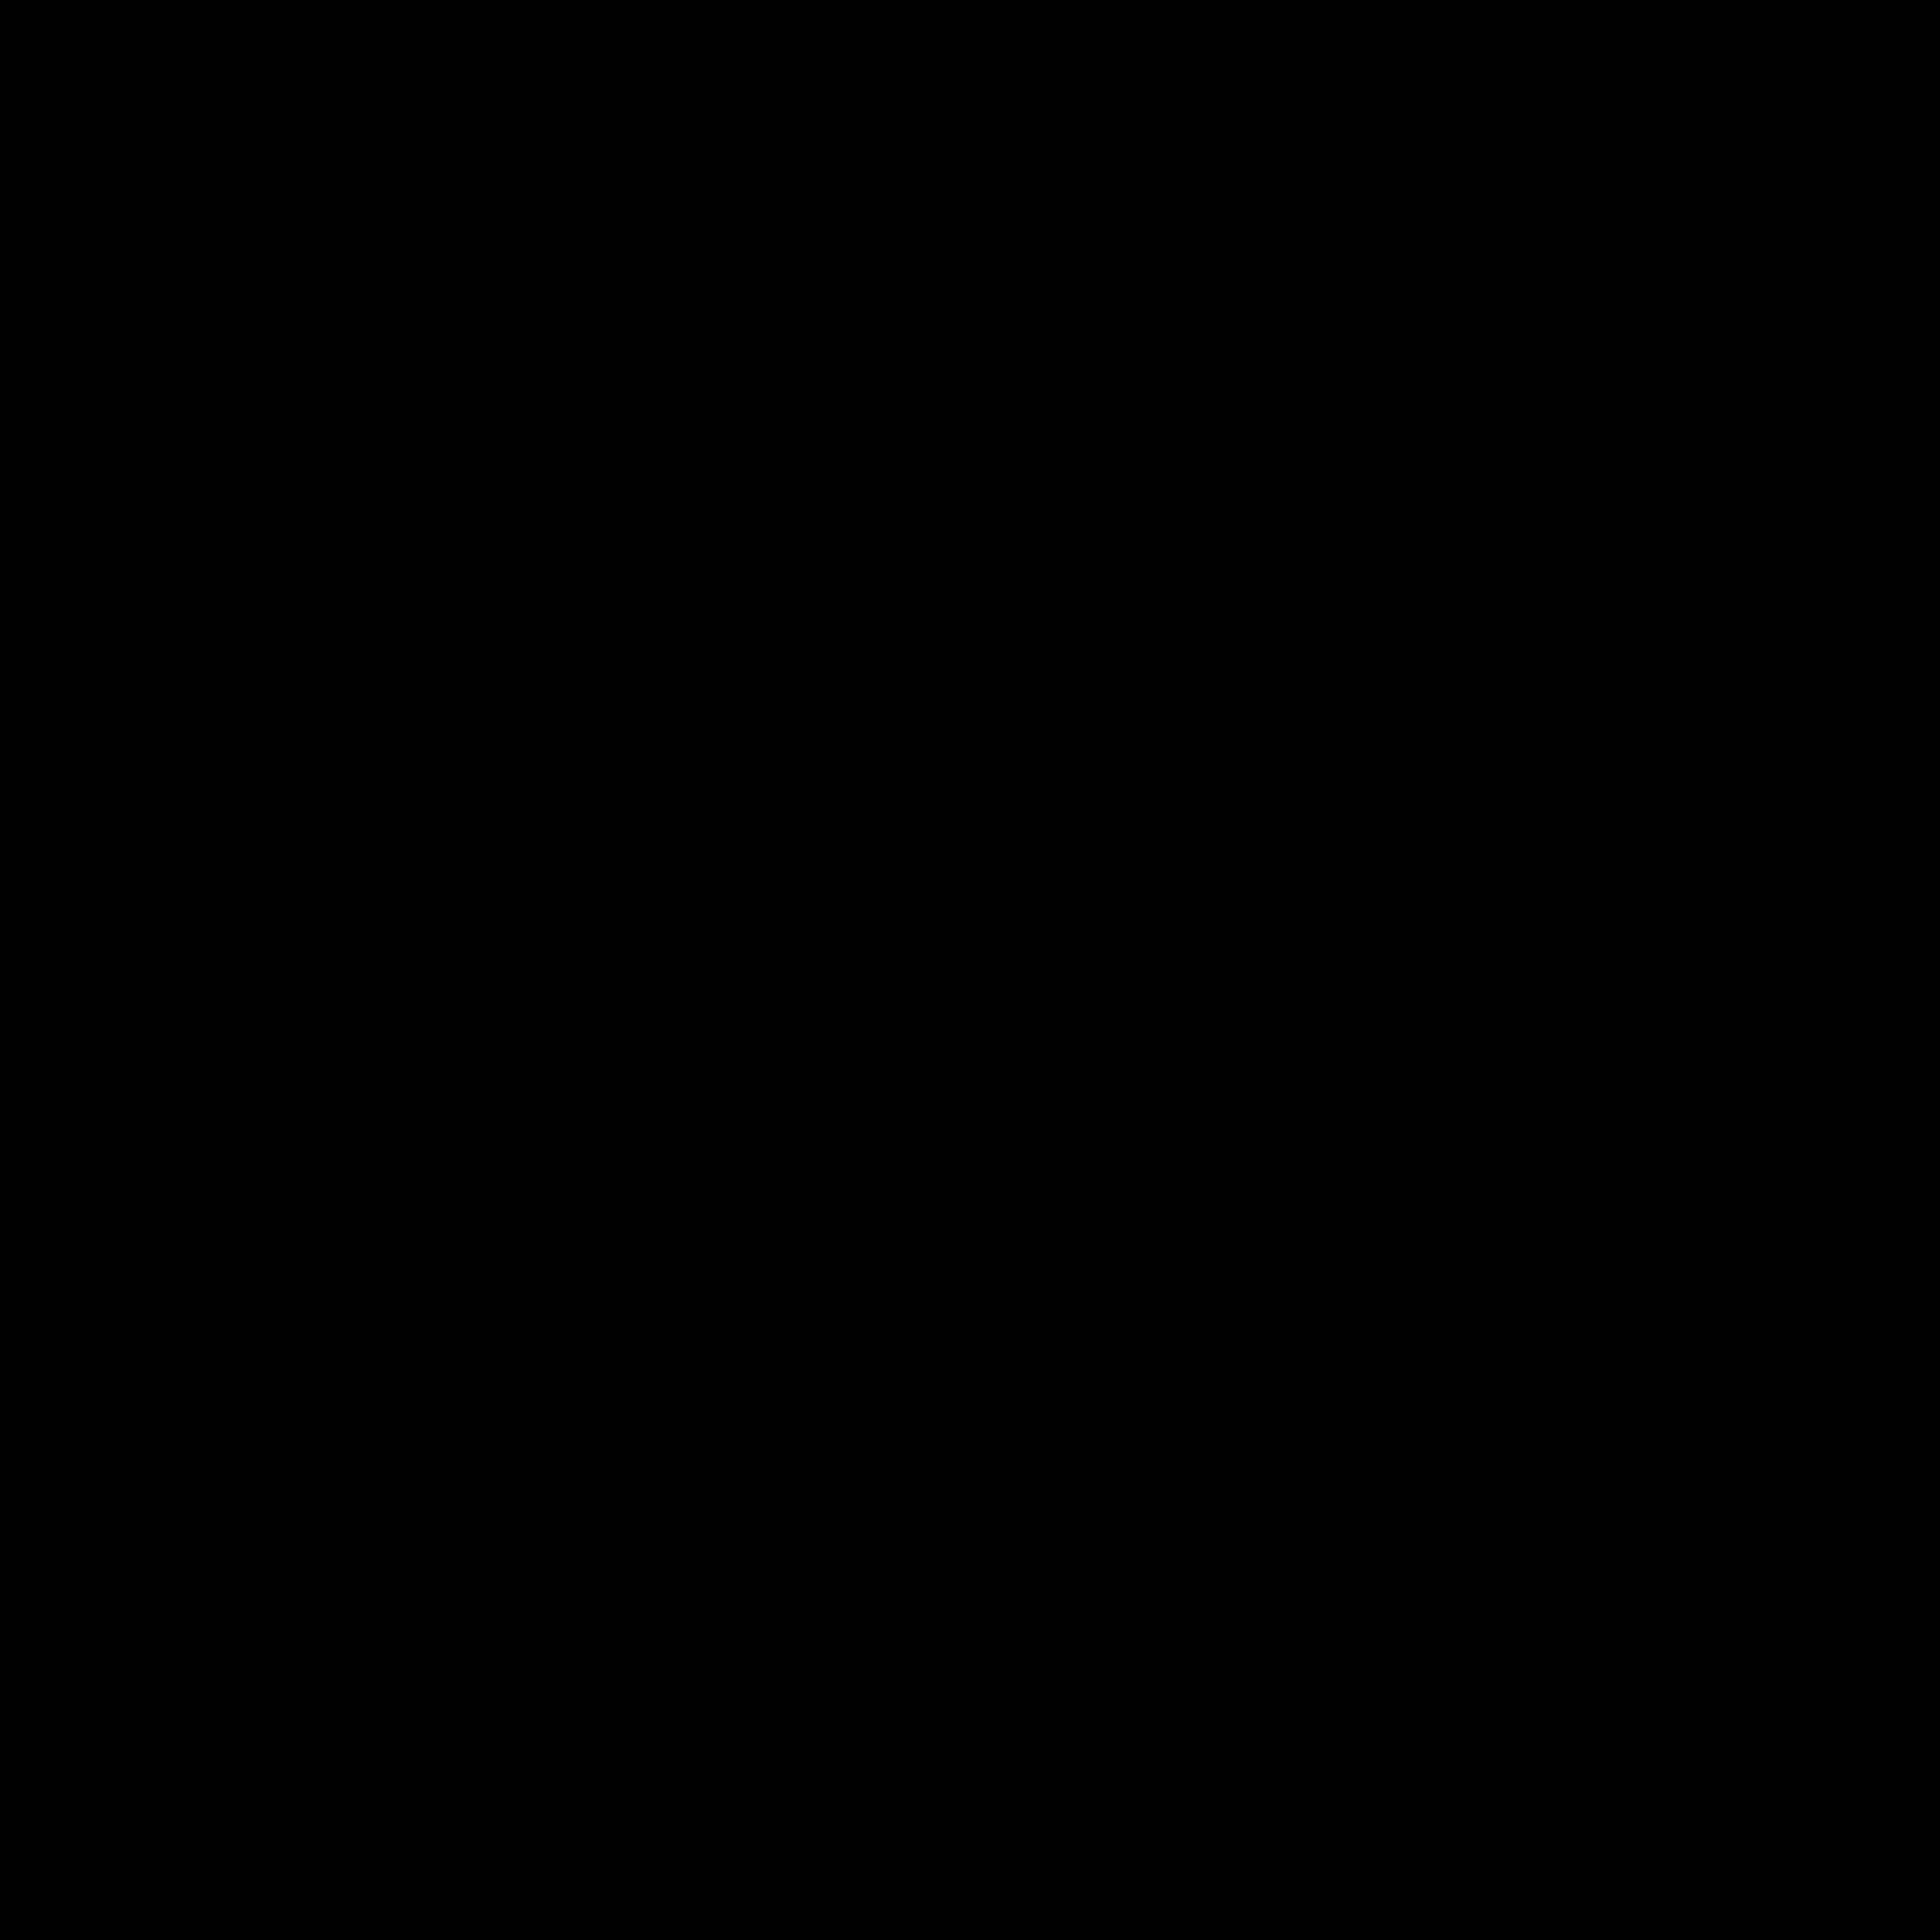 2400x2400 Clipart Of Silhouette Woman 101 Clip Art